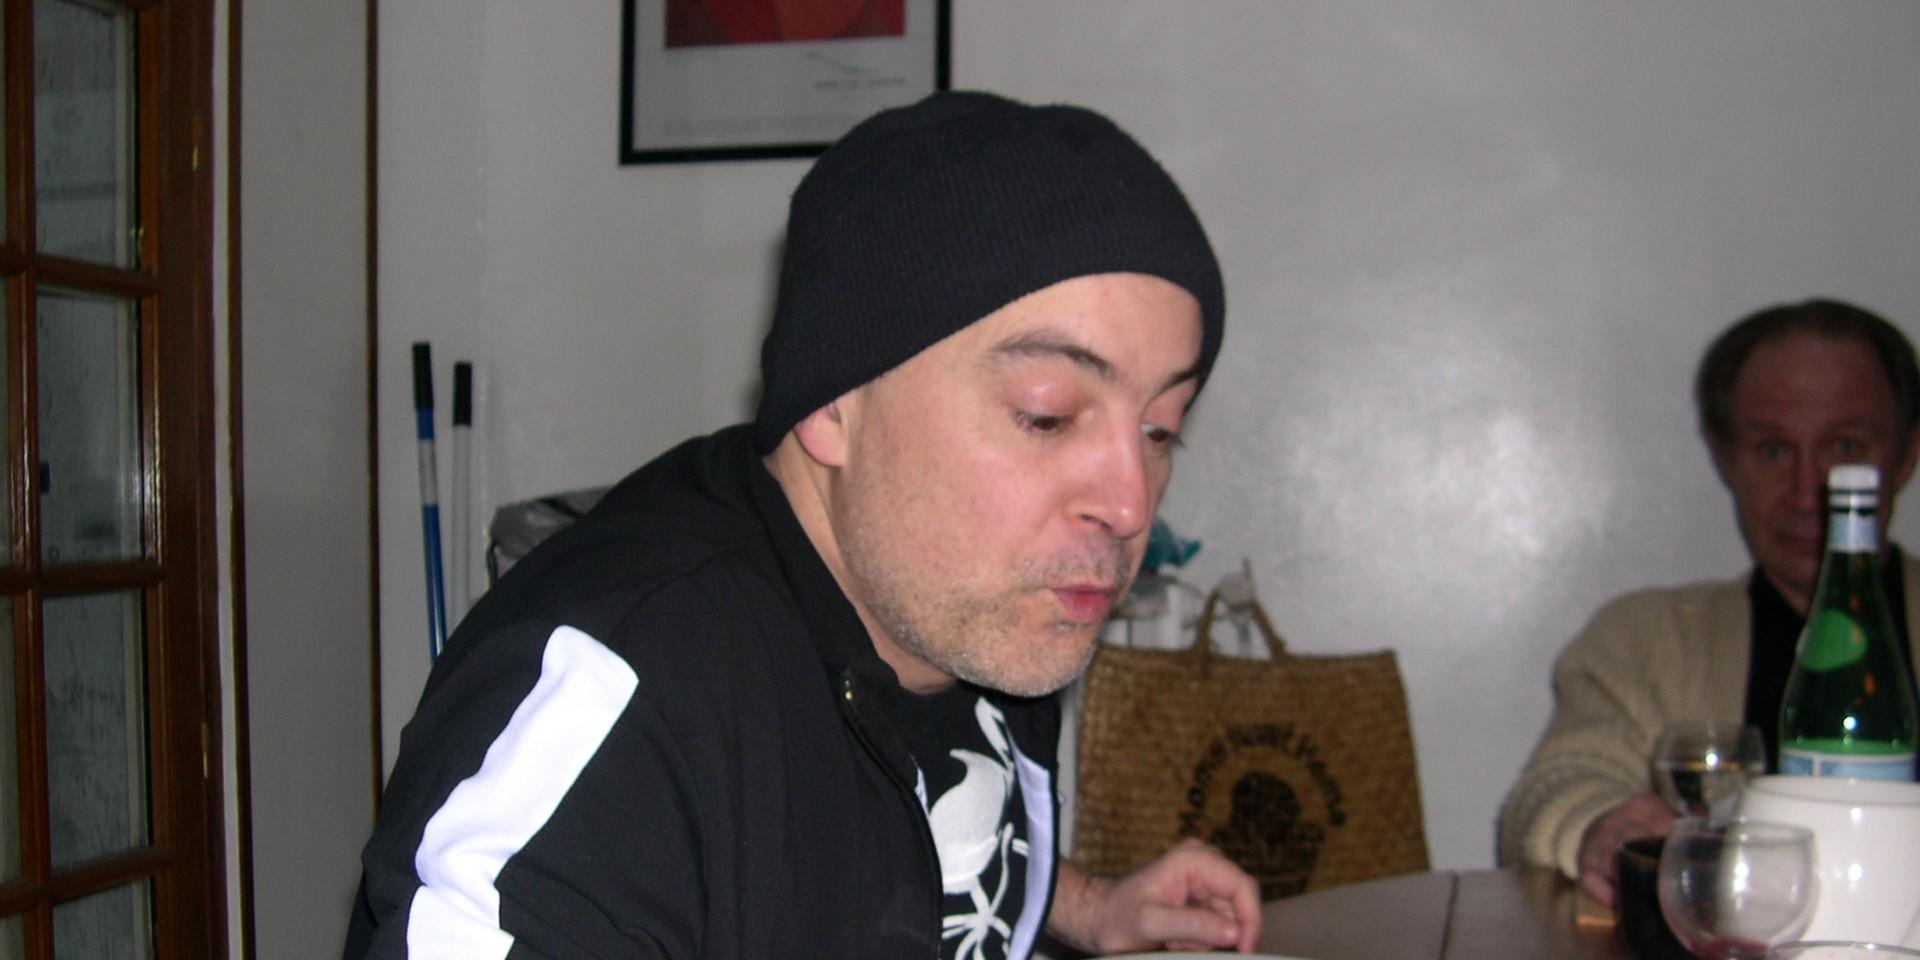 Michael McGregor